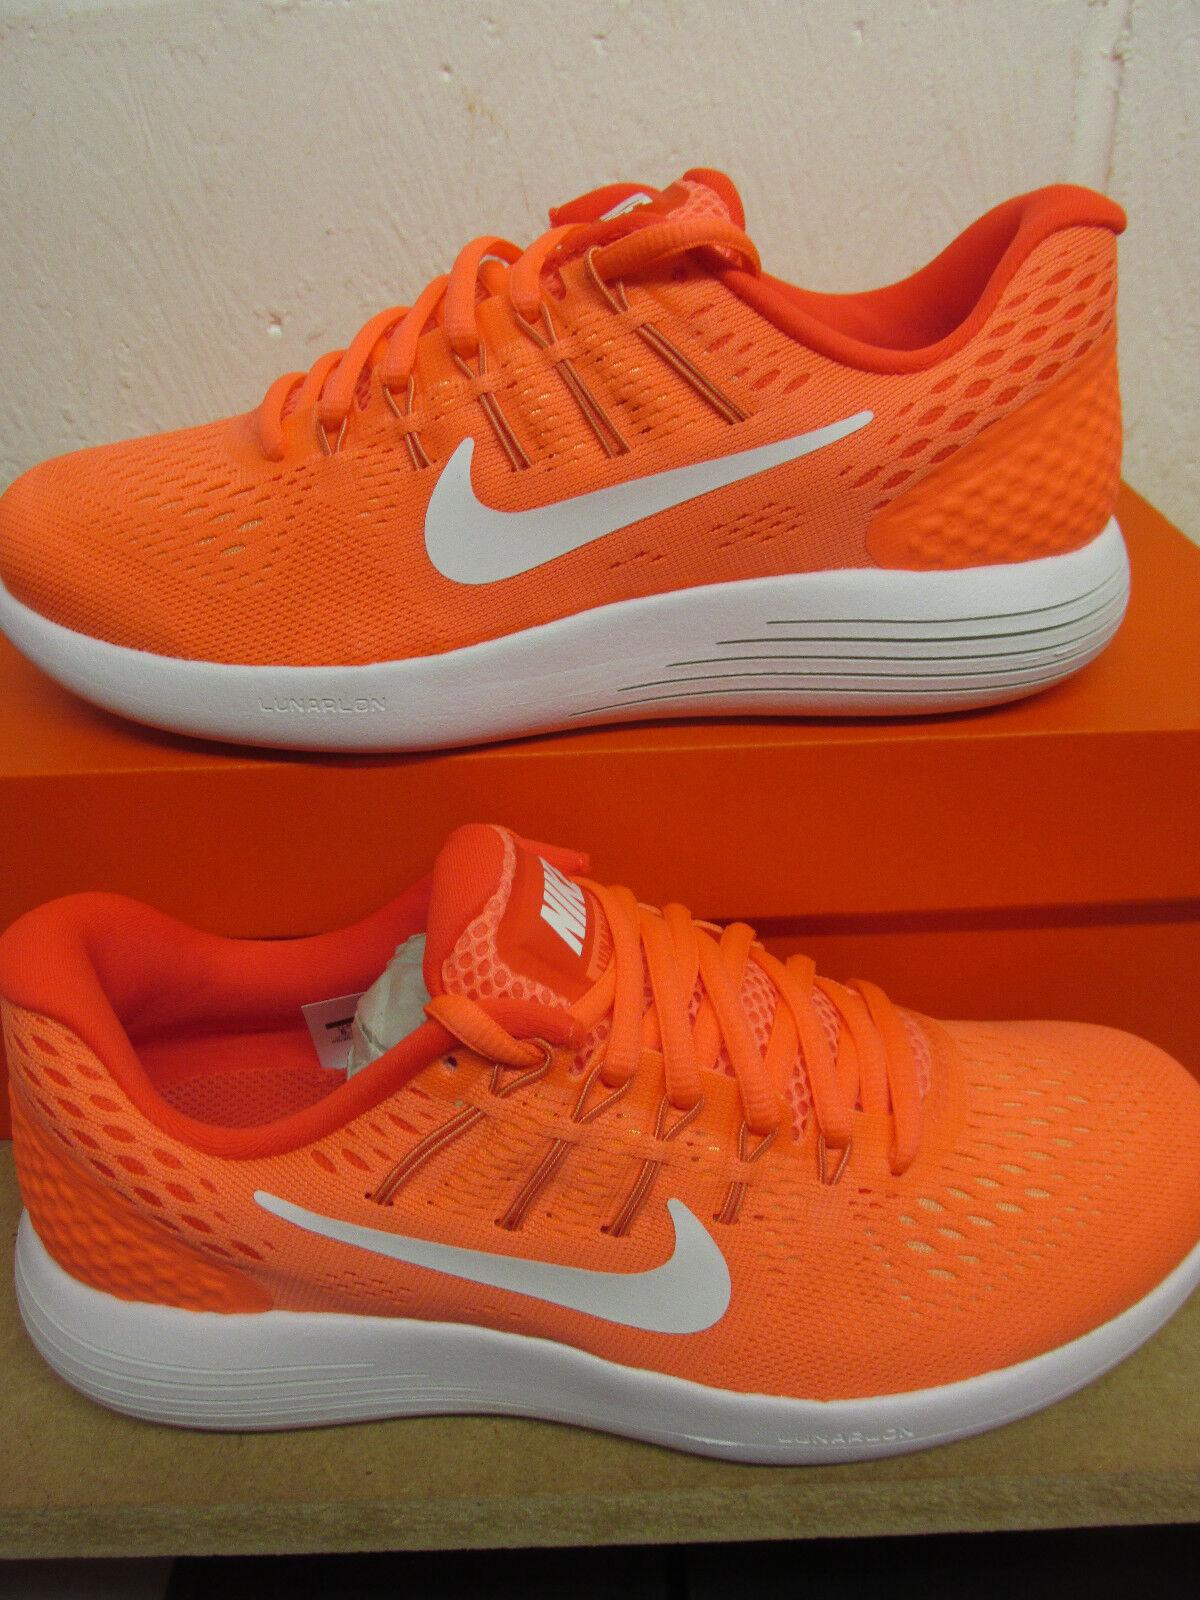 Nike Lunarglide Tenis 8 Zapatillas runing para mujer 843726 800 Tenis Lunarglide Zapatos 6dd015